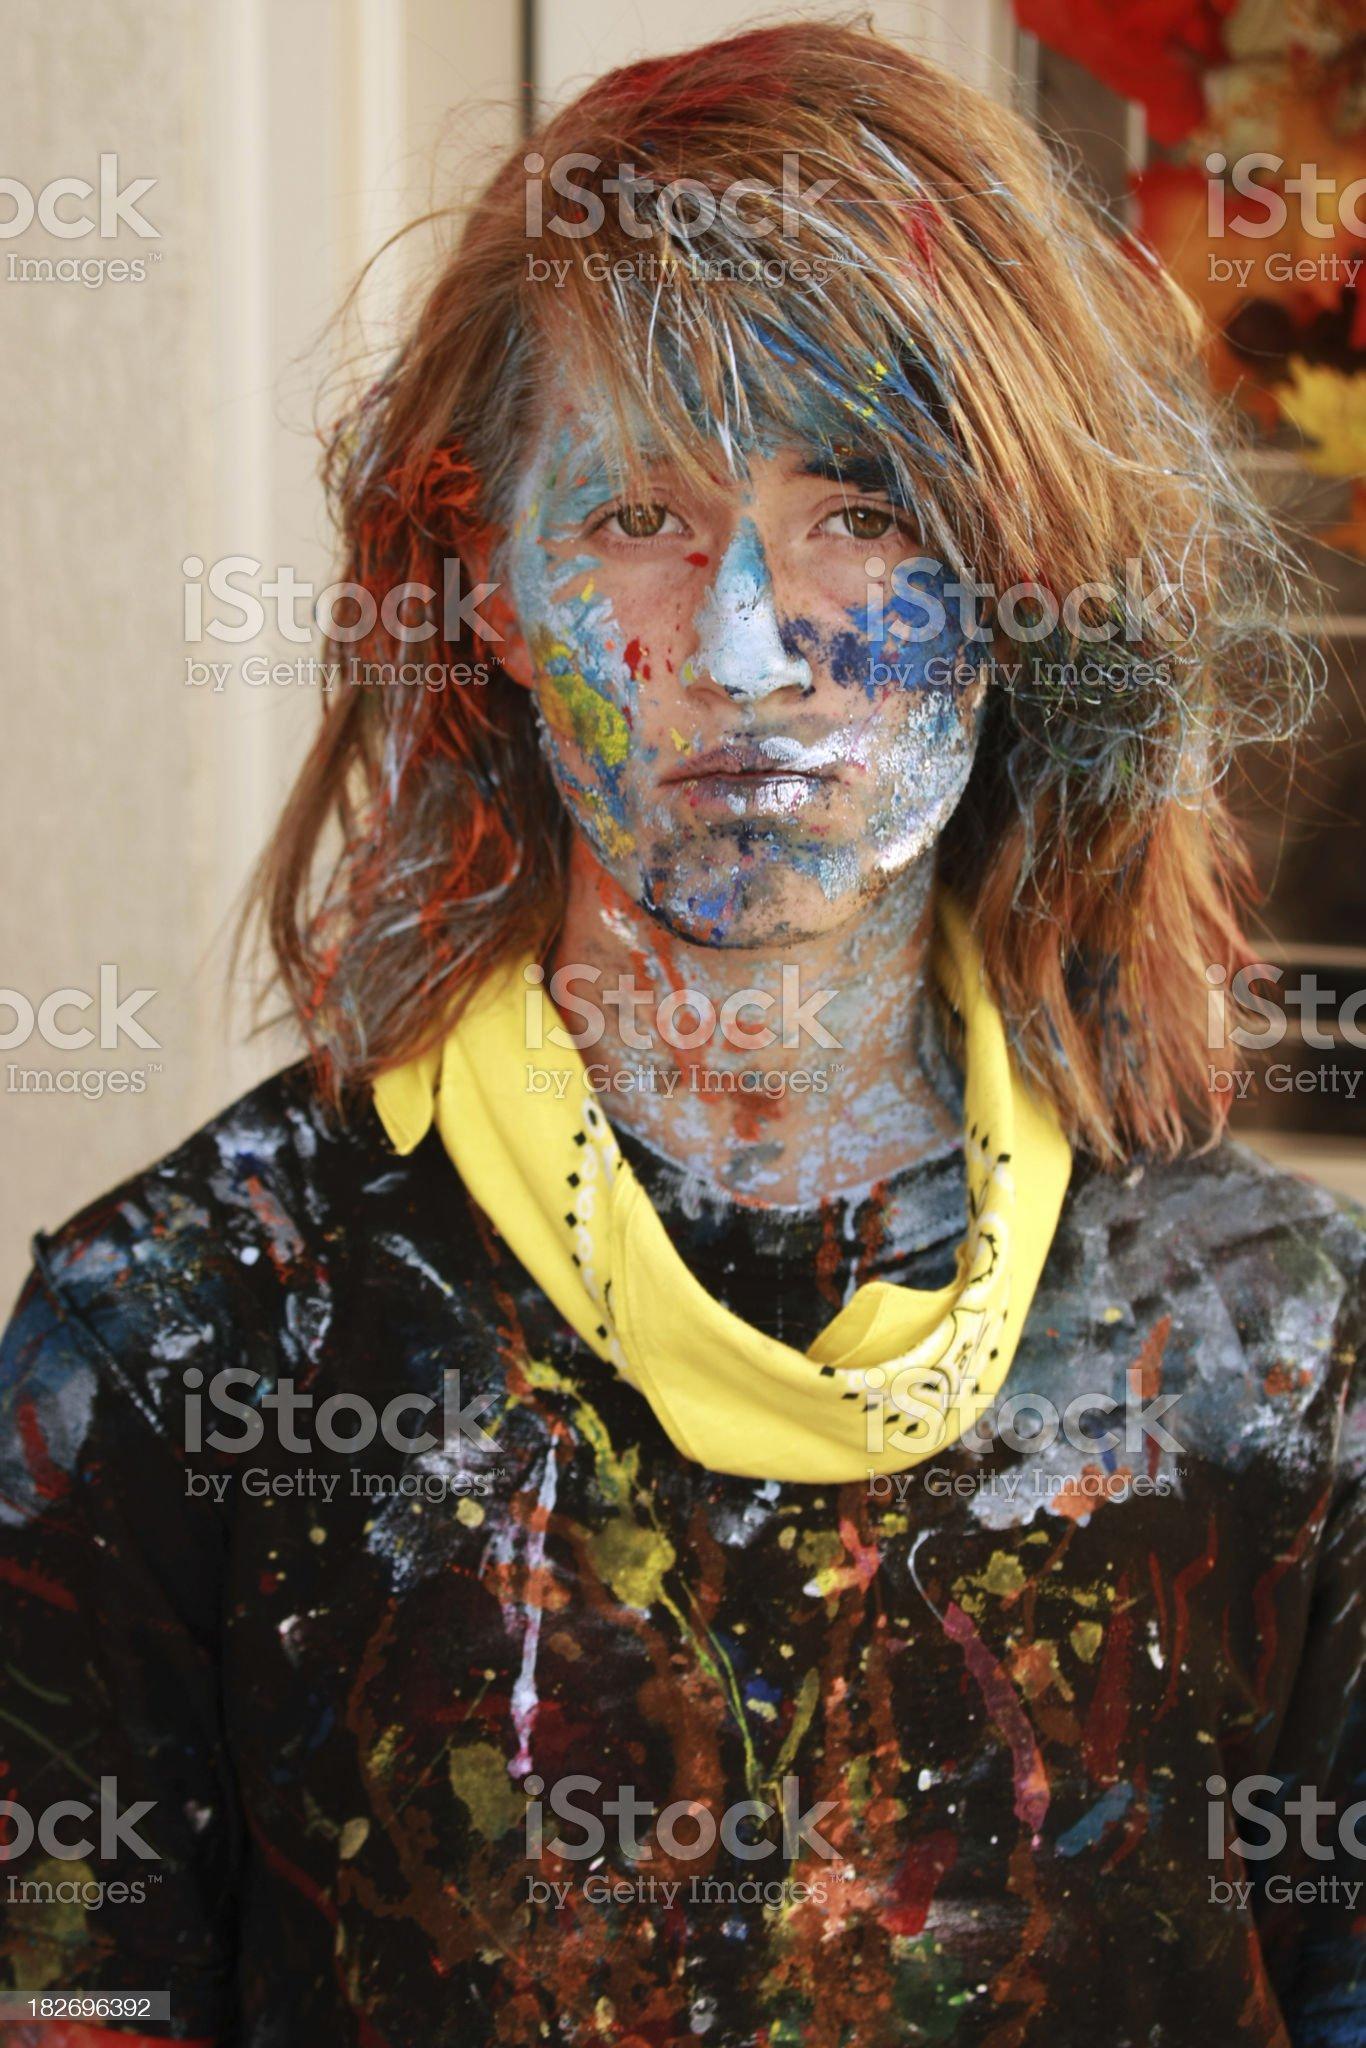 Melancholy Face of Teenage Painter royalty-free stock photo